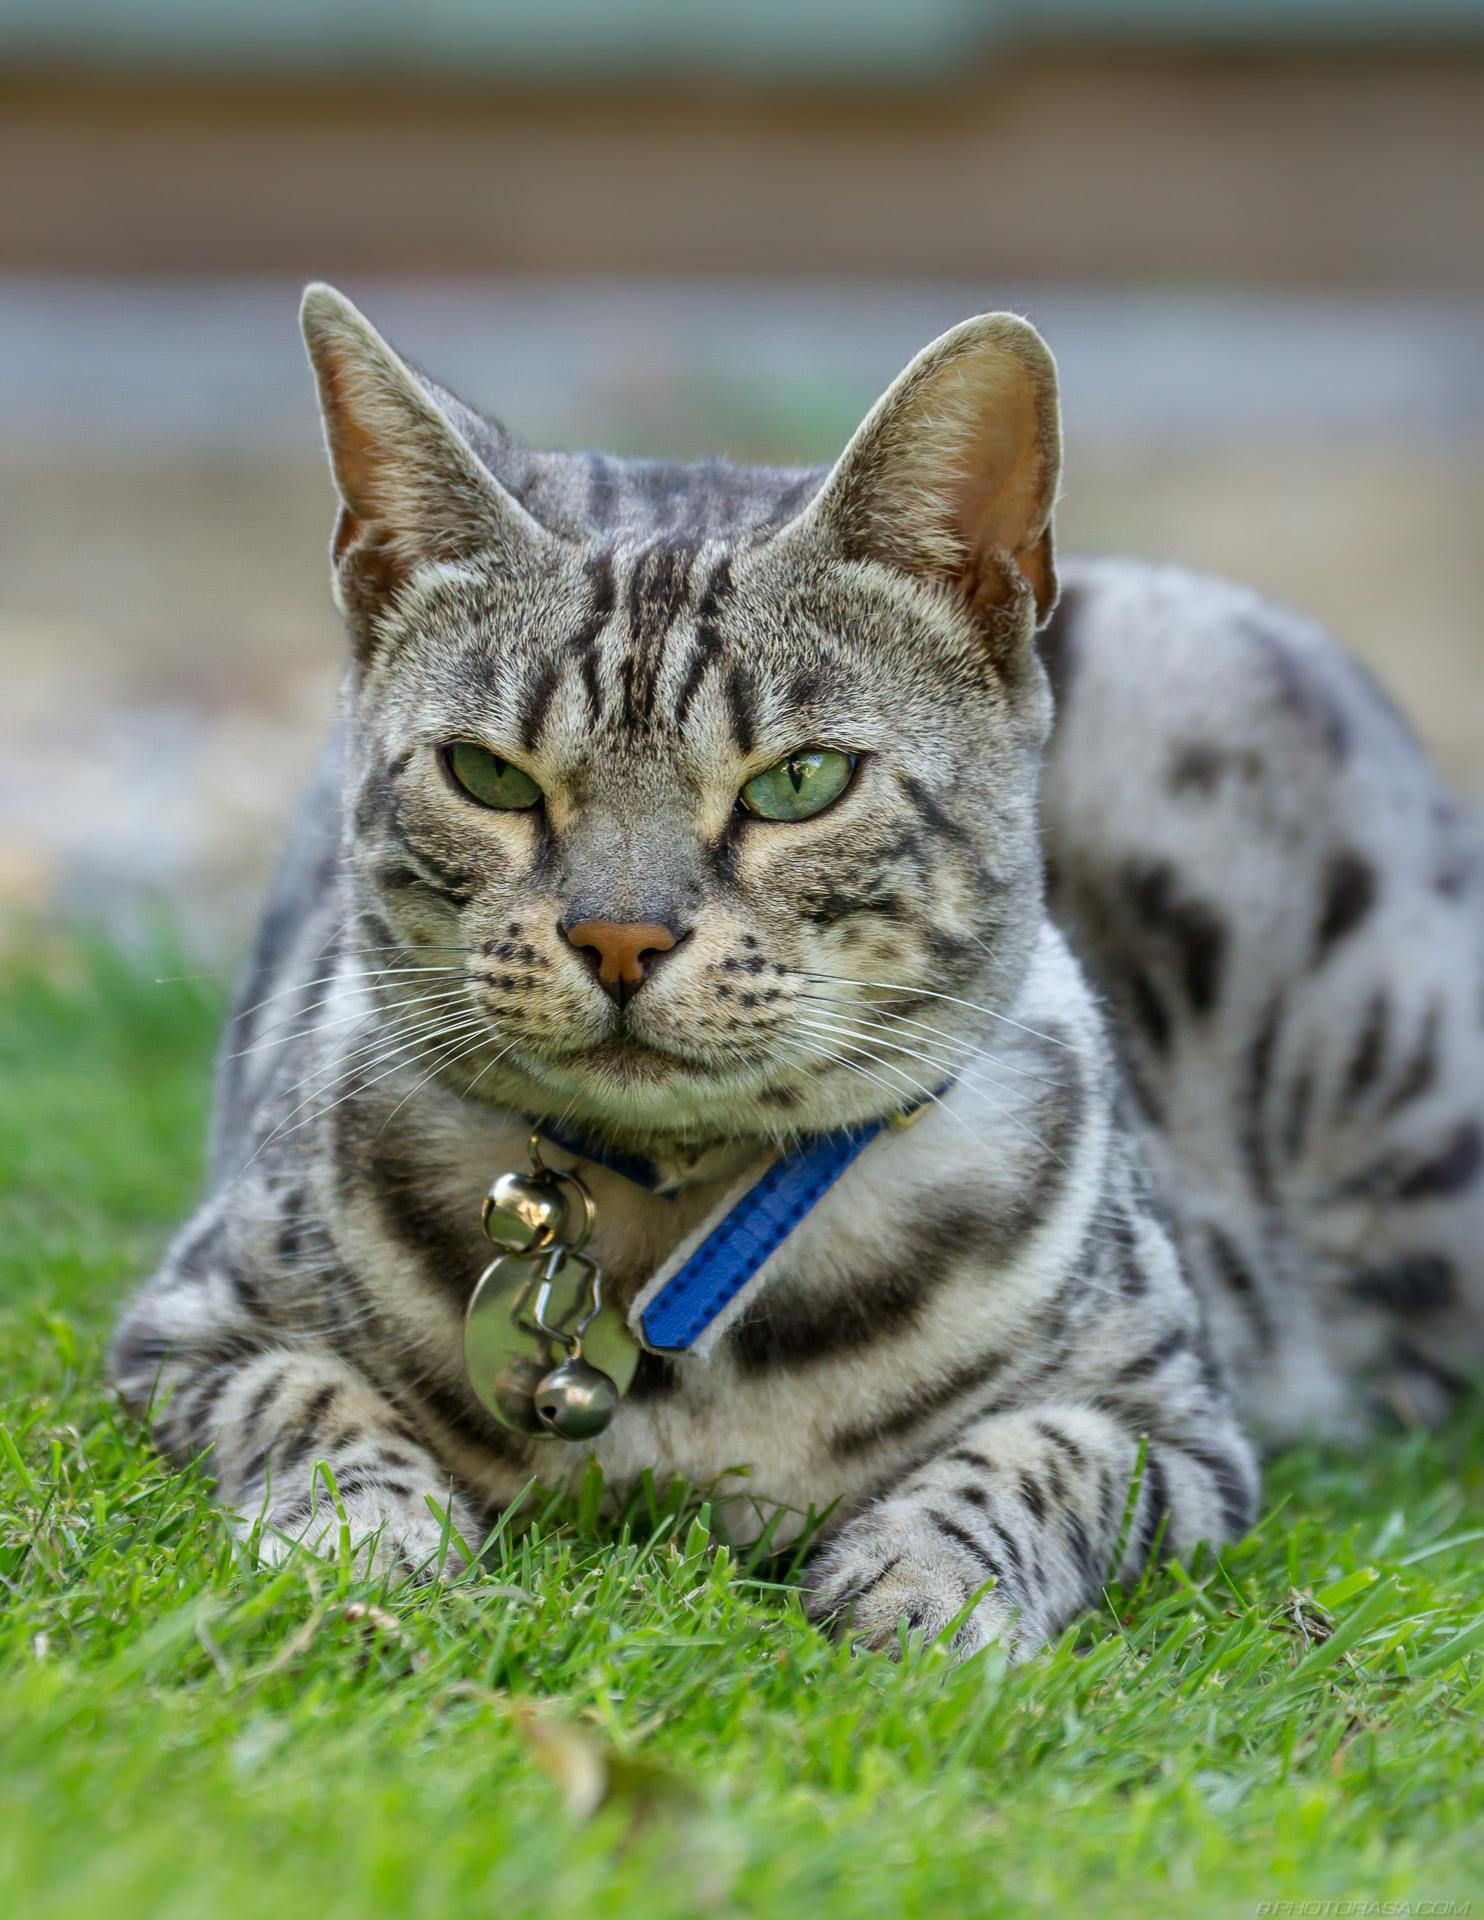 https://photorasa.com/silver-tabby-cat/sleepy-eyes/